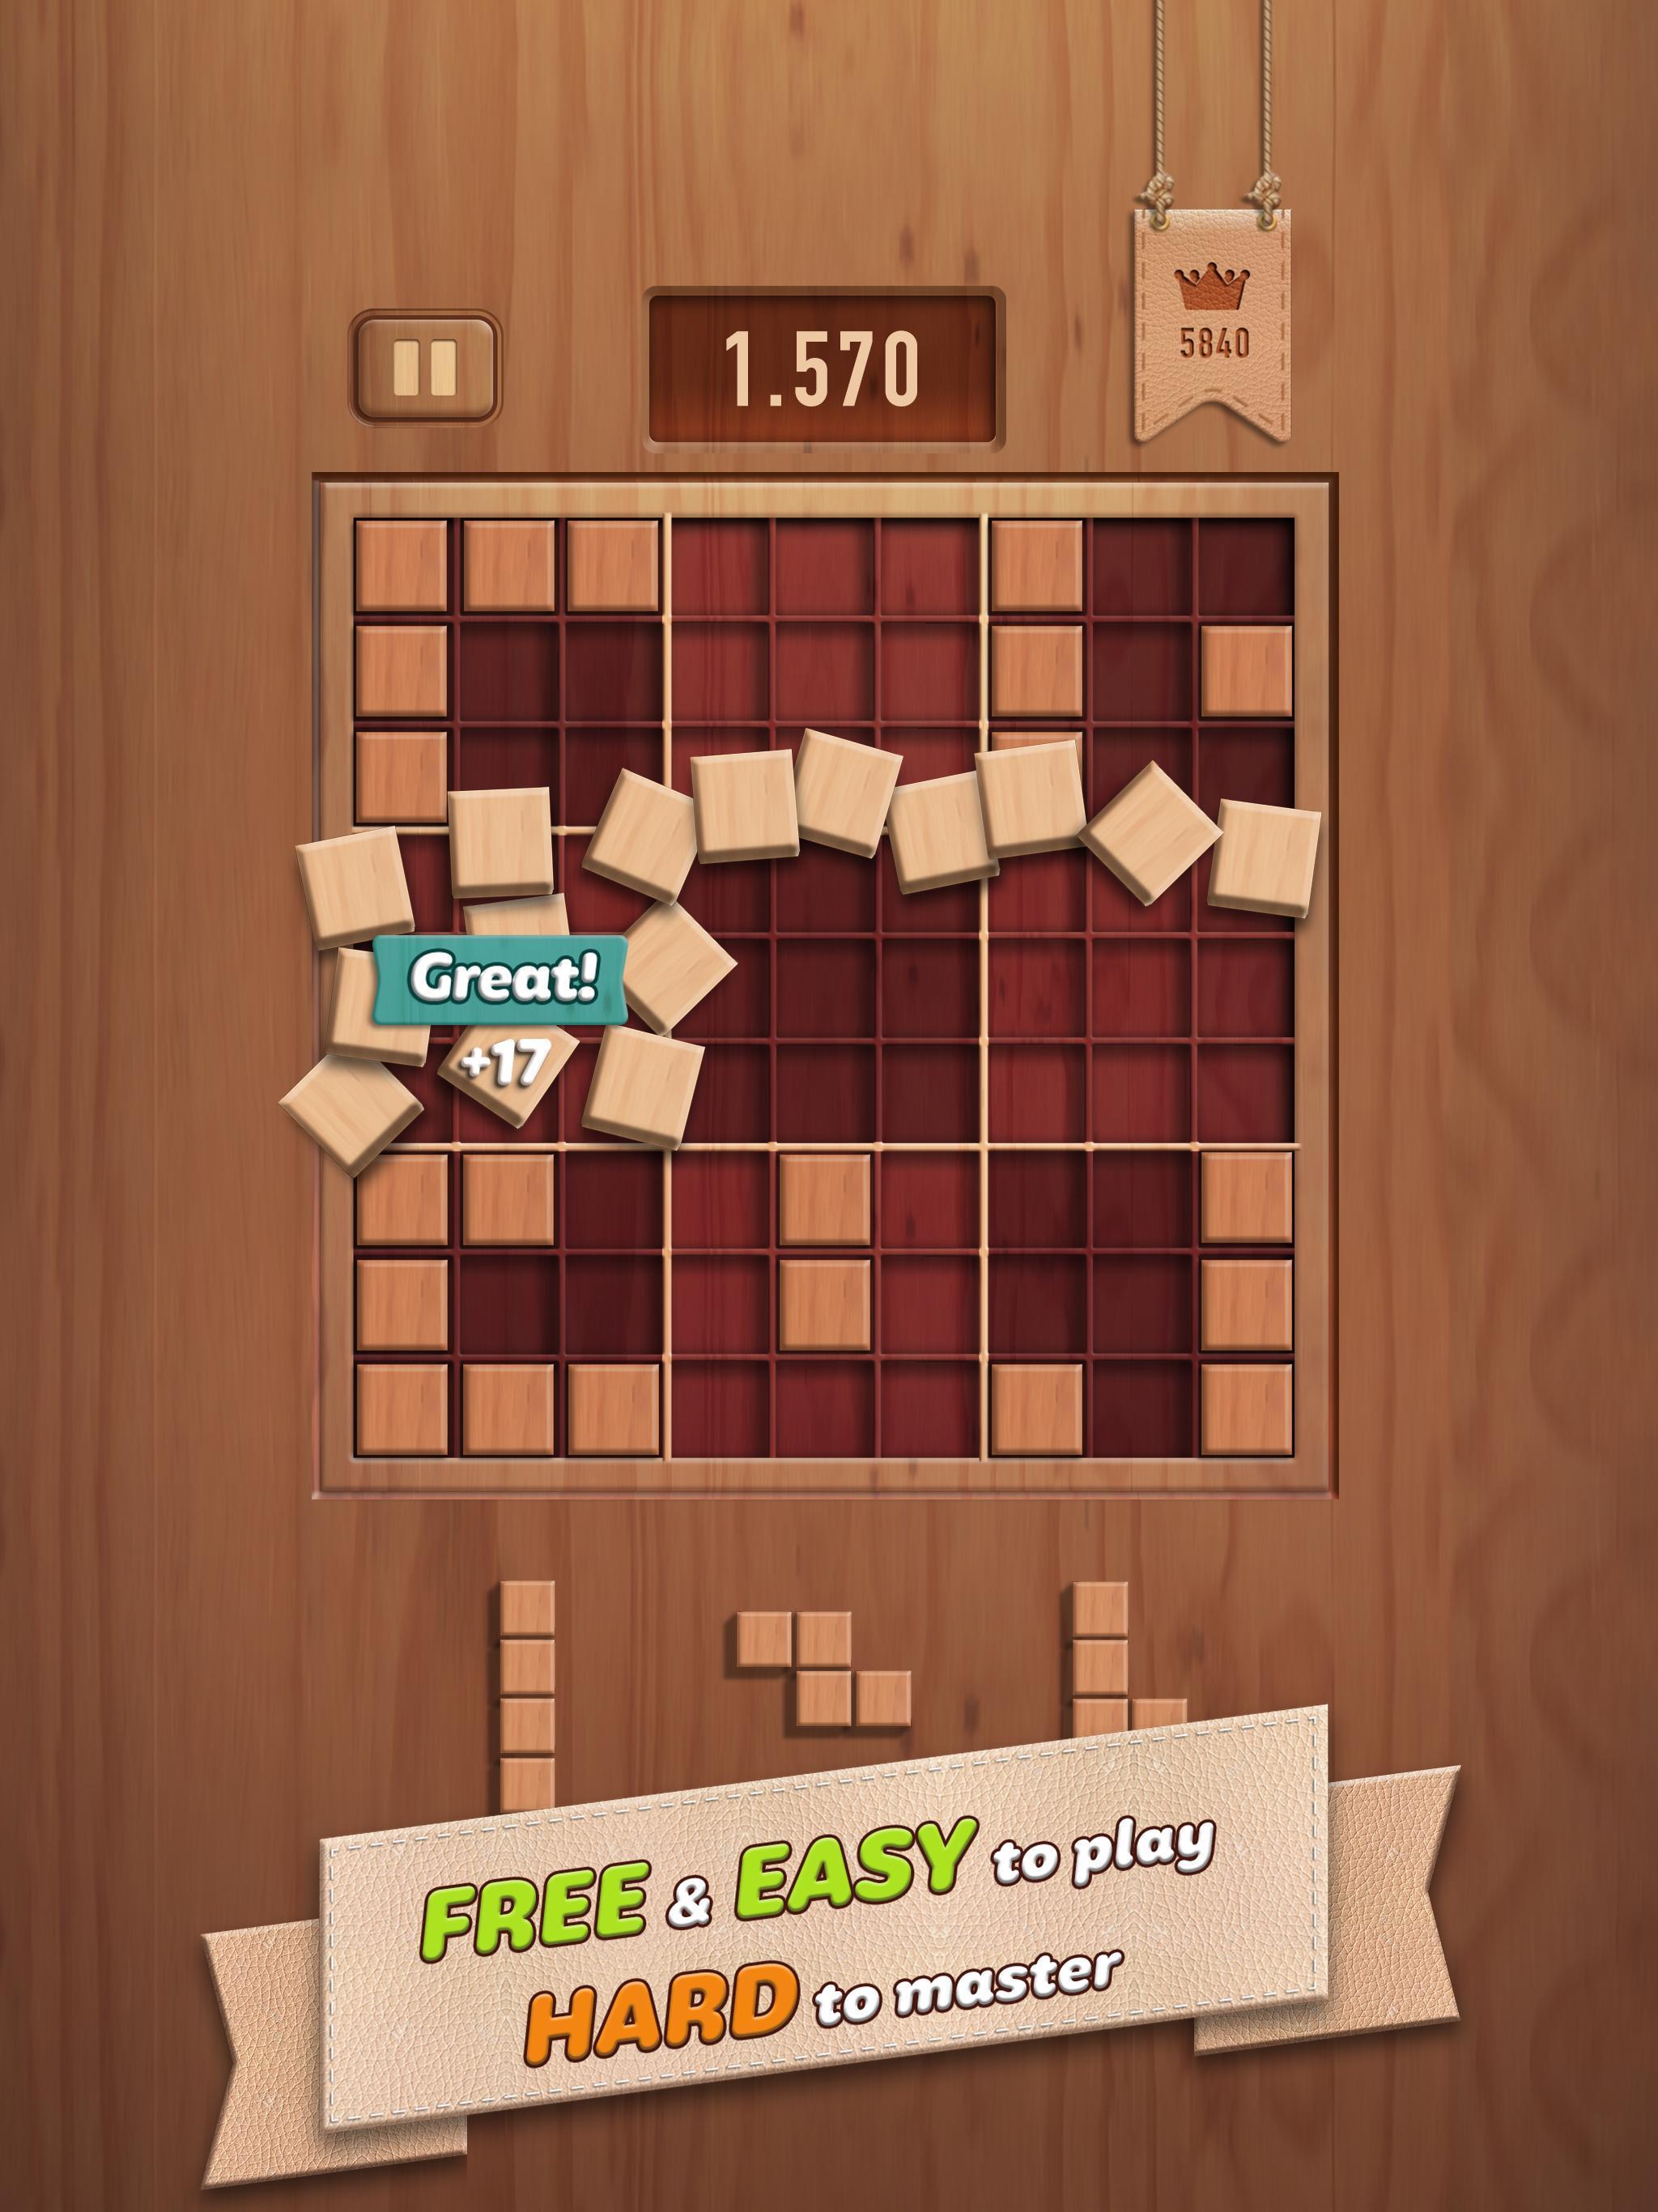 Woody 99 Sudoku Block Puzzle - Free Mind Games 1.2.2 Screenshot 8